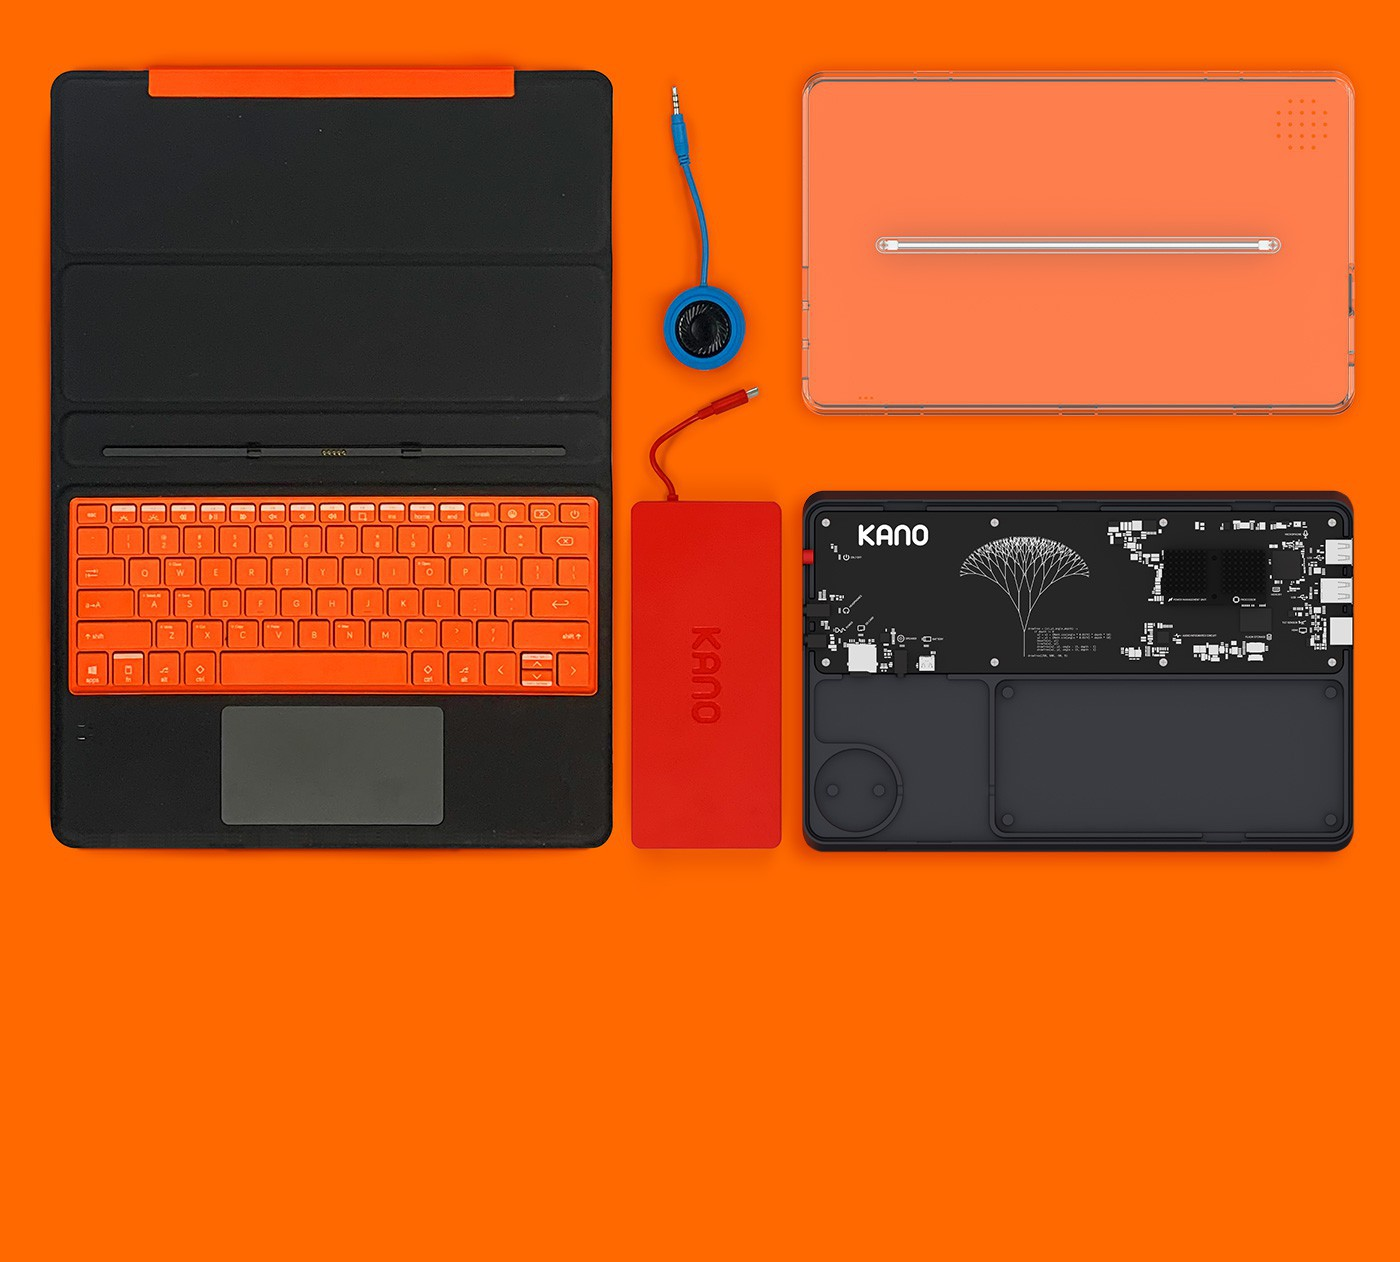 Build the Kano PC